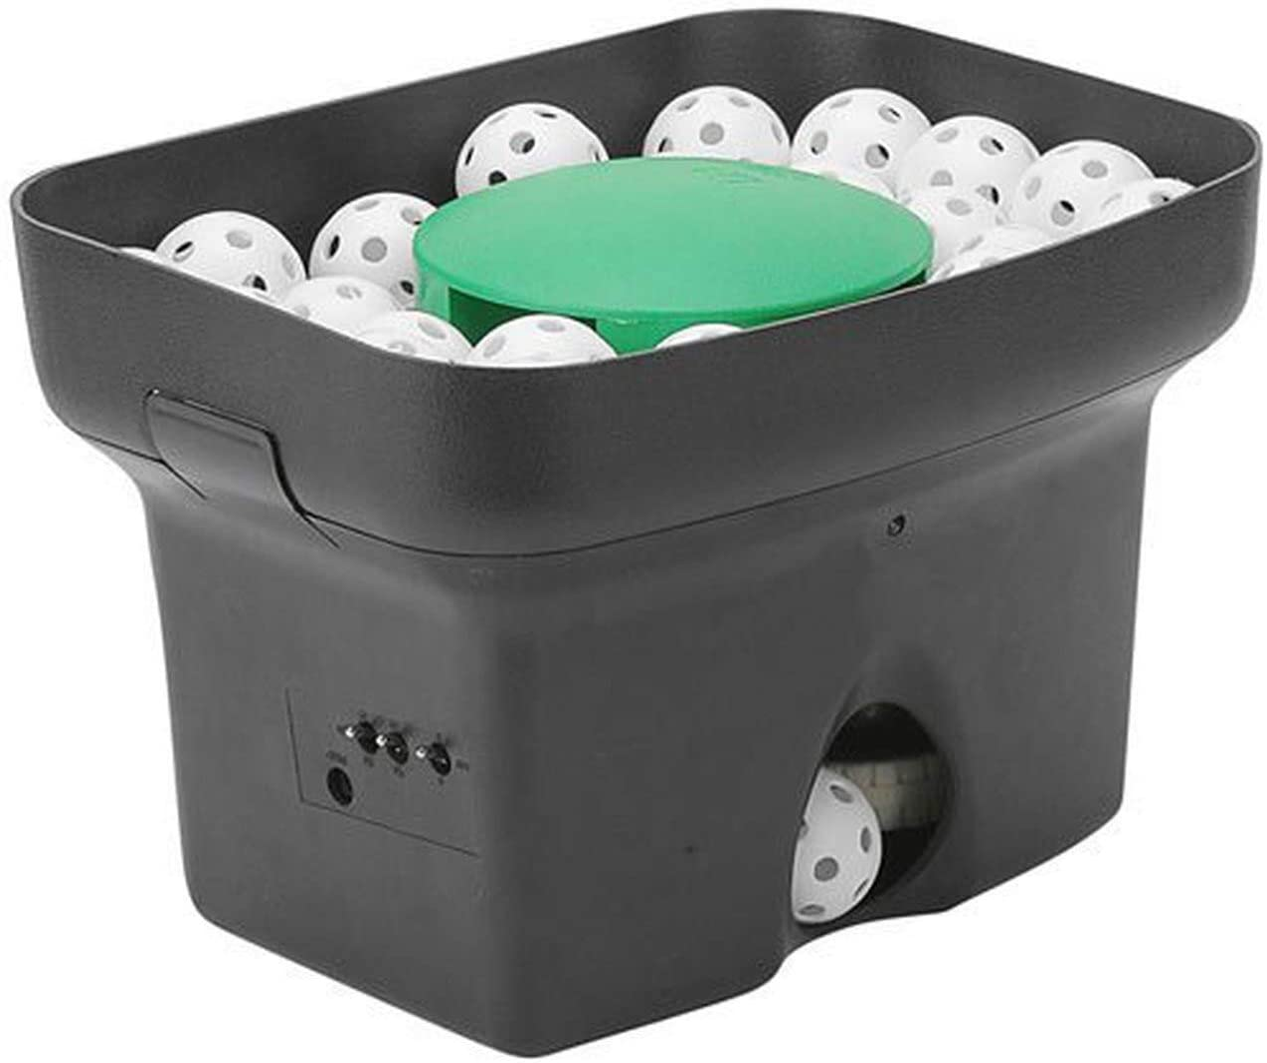 Personal Pitcher Super Max 90% OFF intense SALE Pro Pitching Machine w Balls Small Bal Golf 48